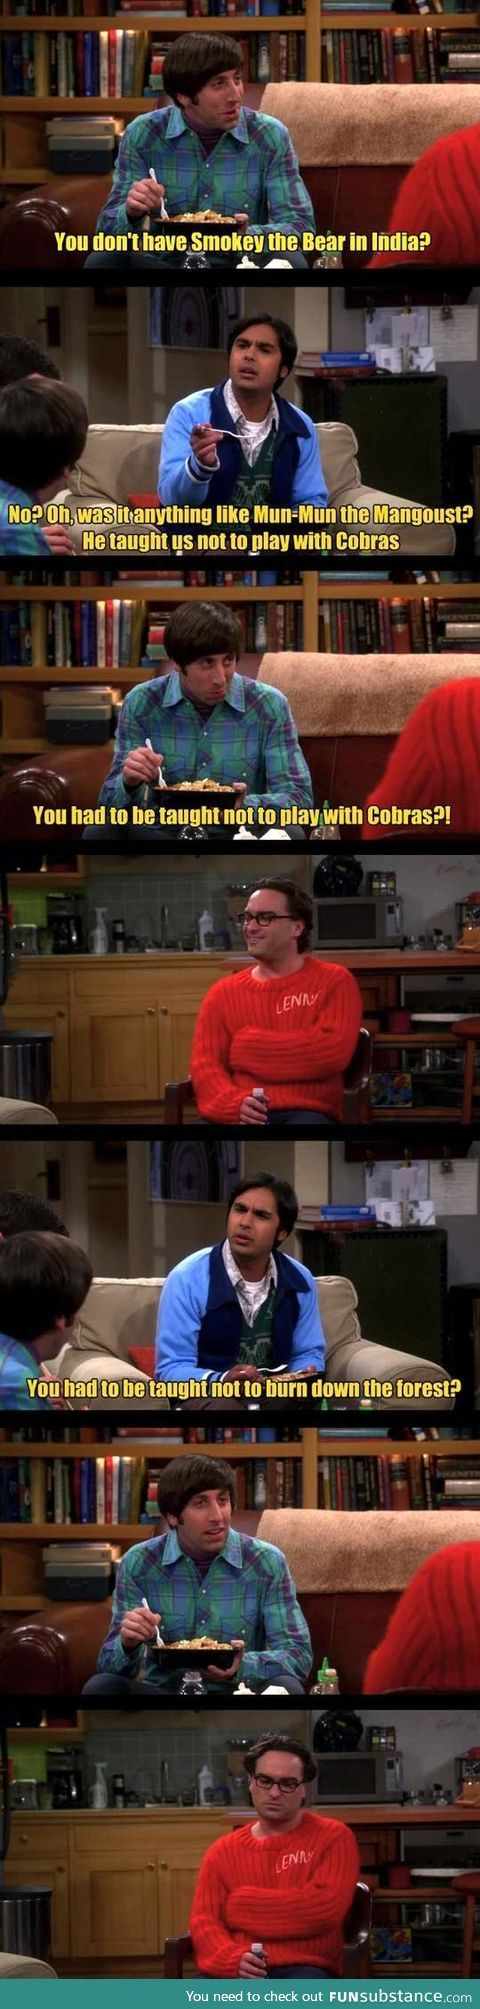 Funny big bang theory pictures 27 pics - Big Bang Theory Oh Raj You Have A Point